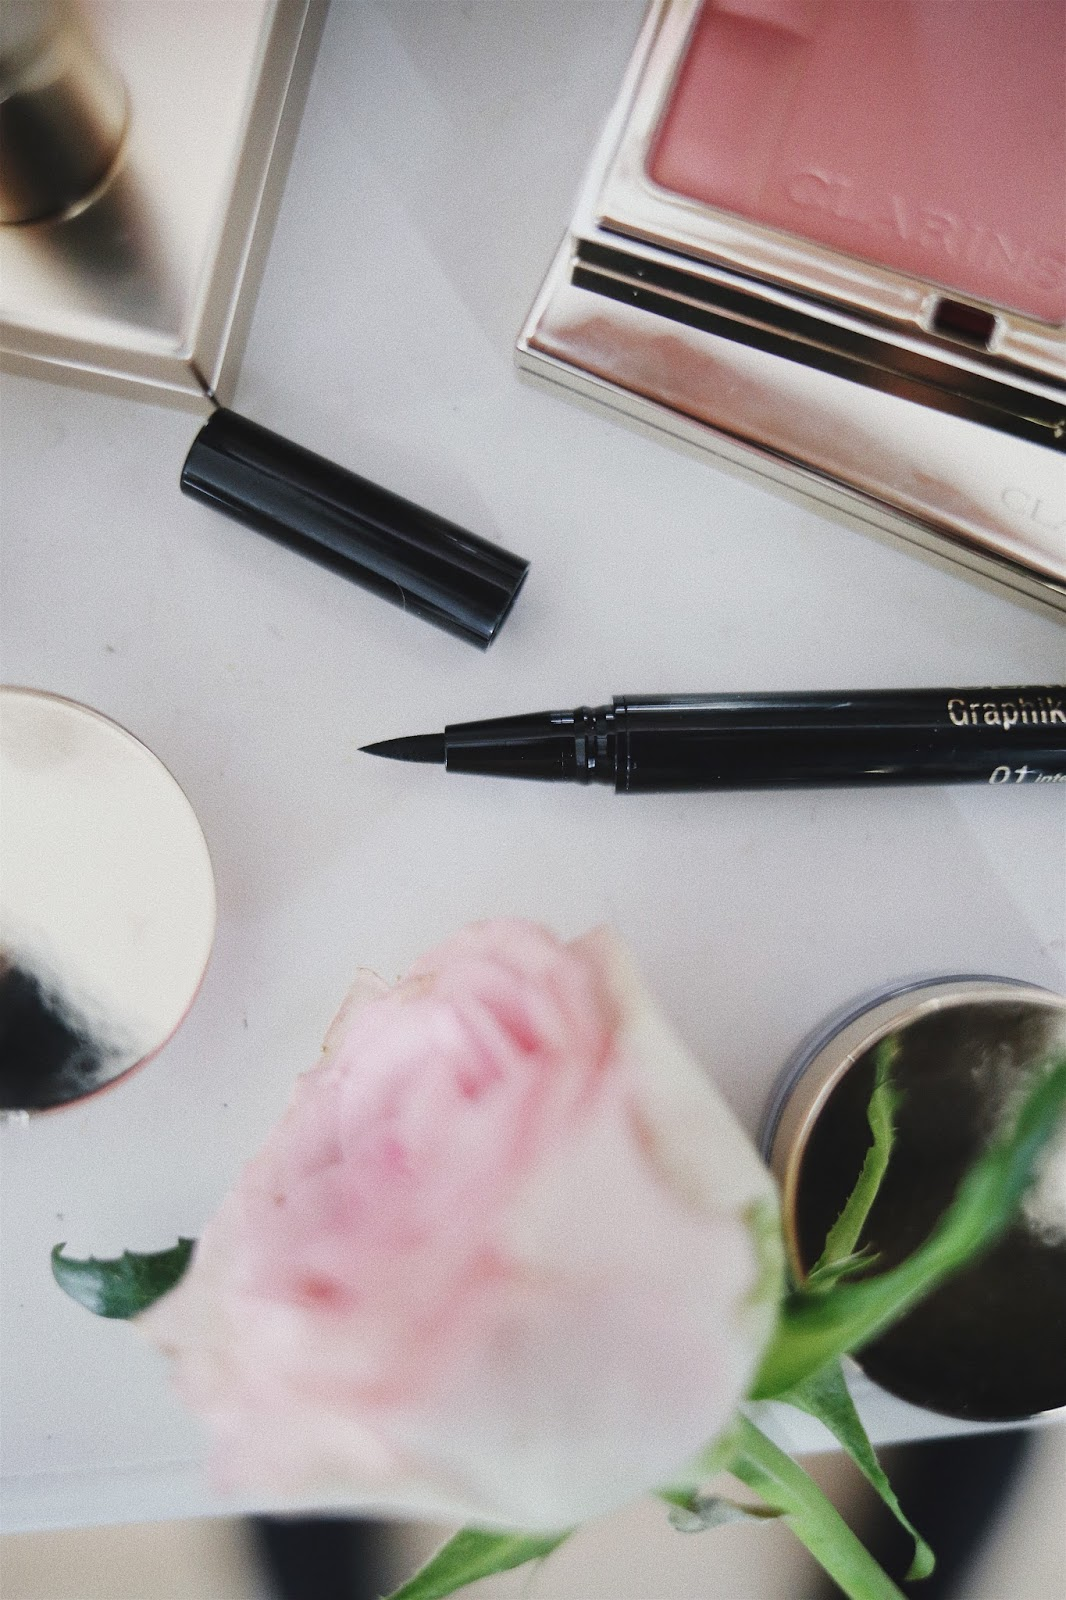 Graphik , Collection Automne 2017 , Clarins, Revue , Avis , Swatch, Blog beauté , Blush Prodige, Ombre Matte , rosemademoiselle , rose mademoiselle